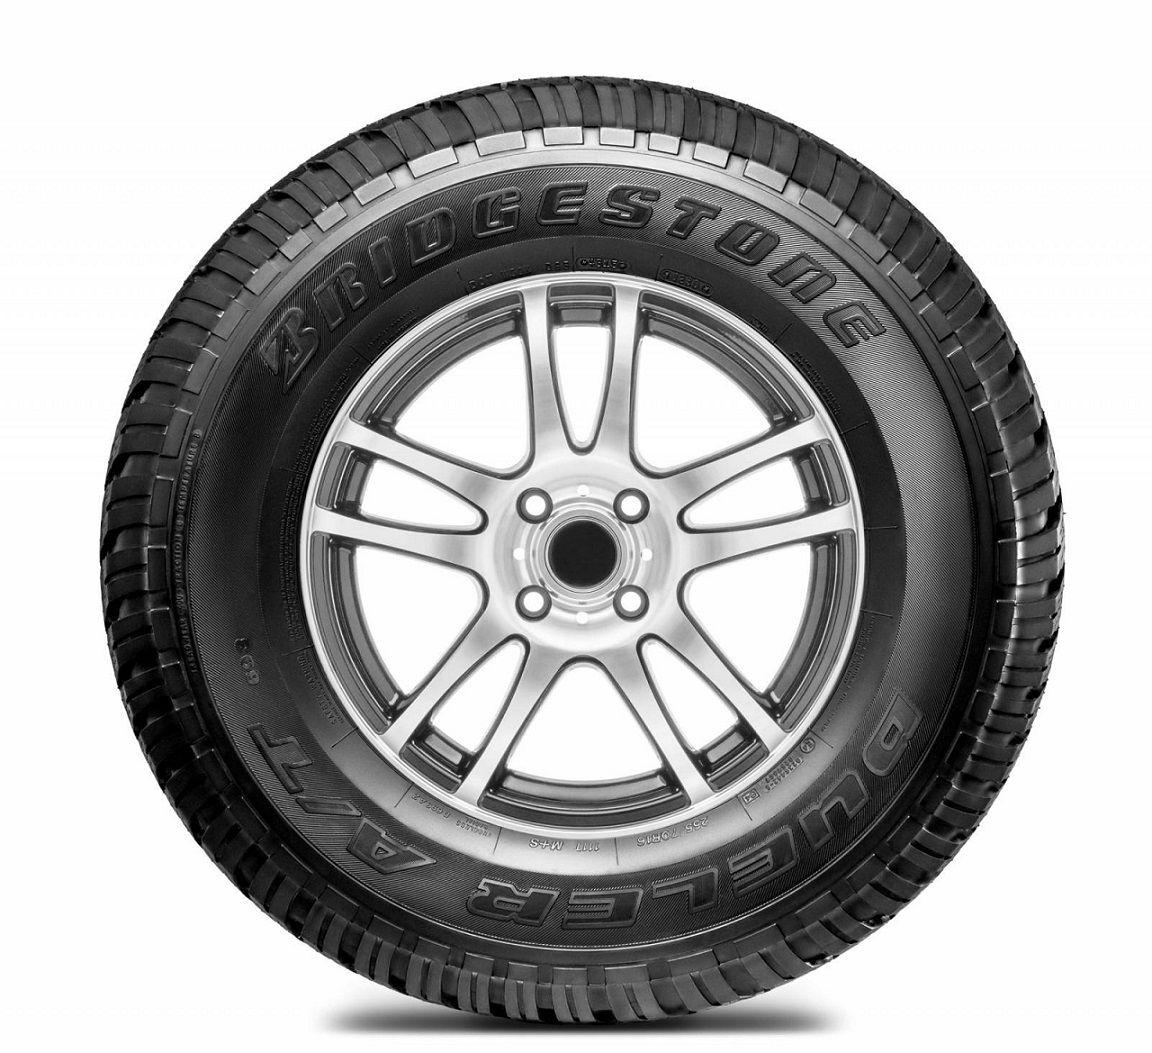 Pneu 31 X 10,5 R 15 - Dueler A/t 693 109s - Bridgestone